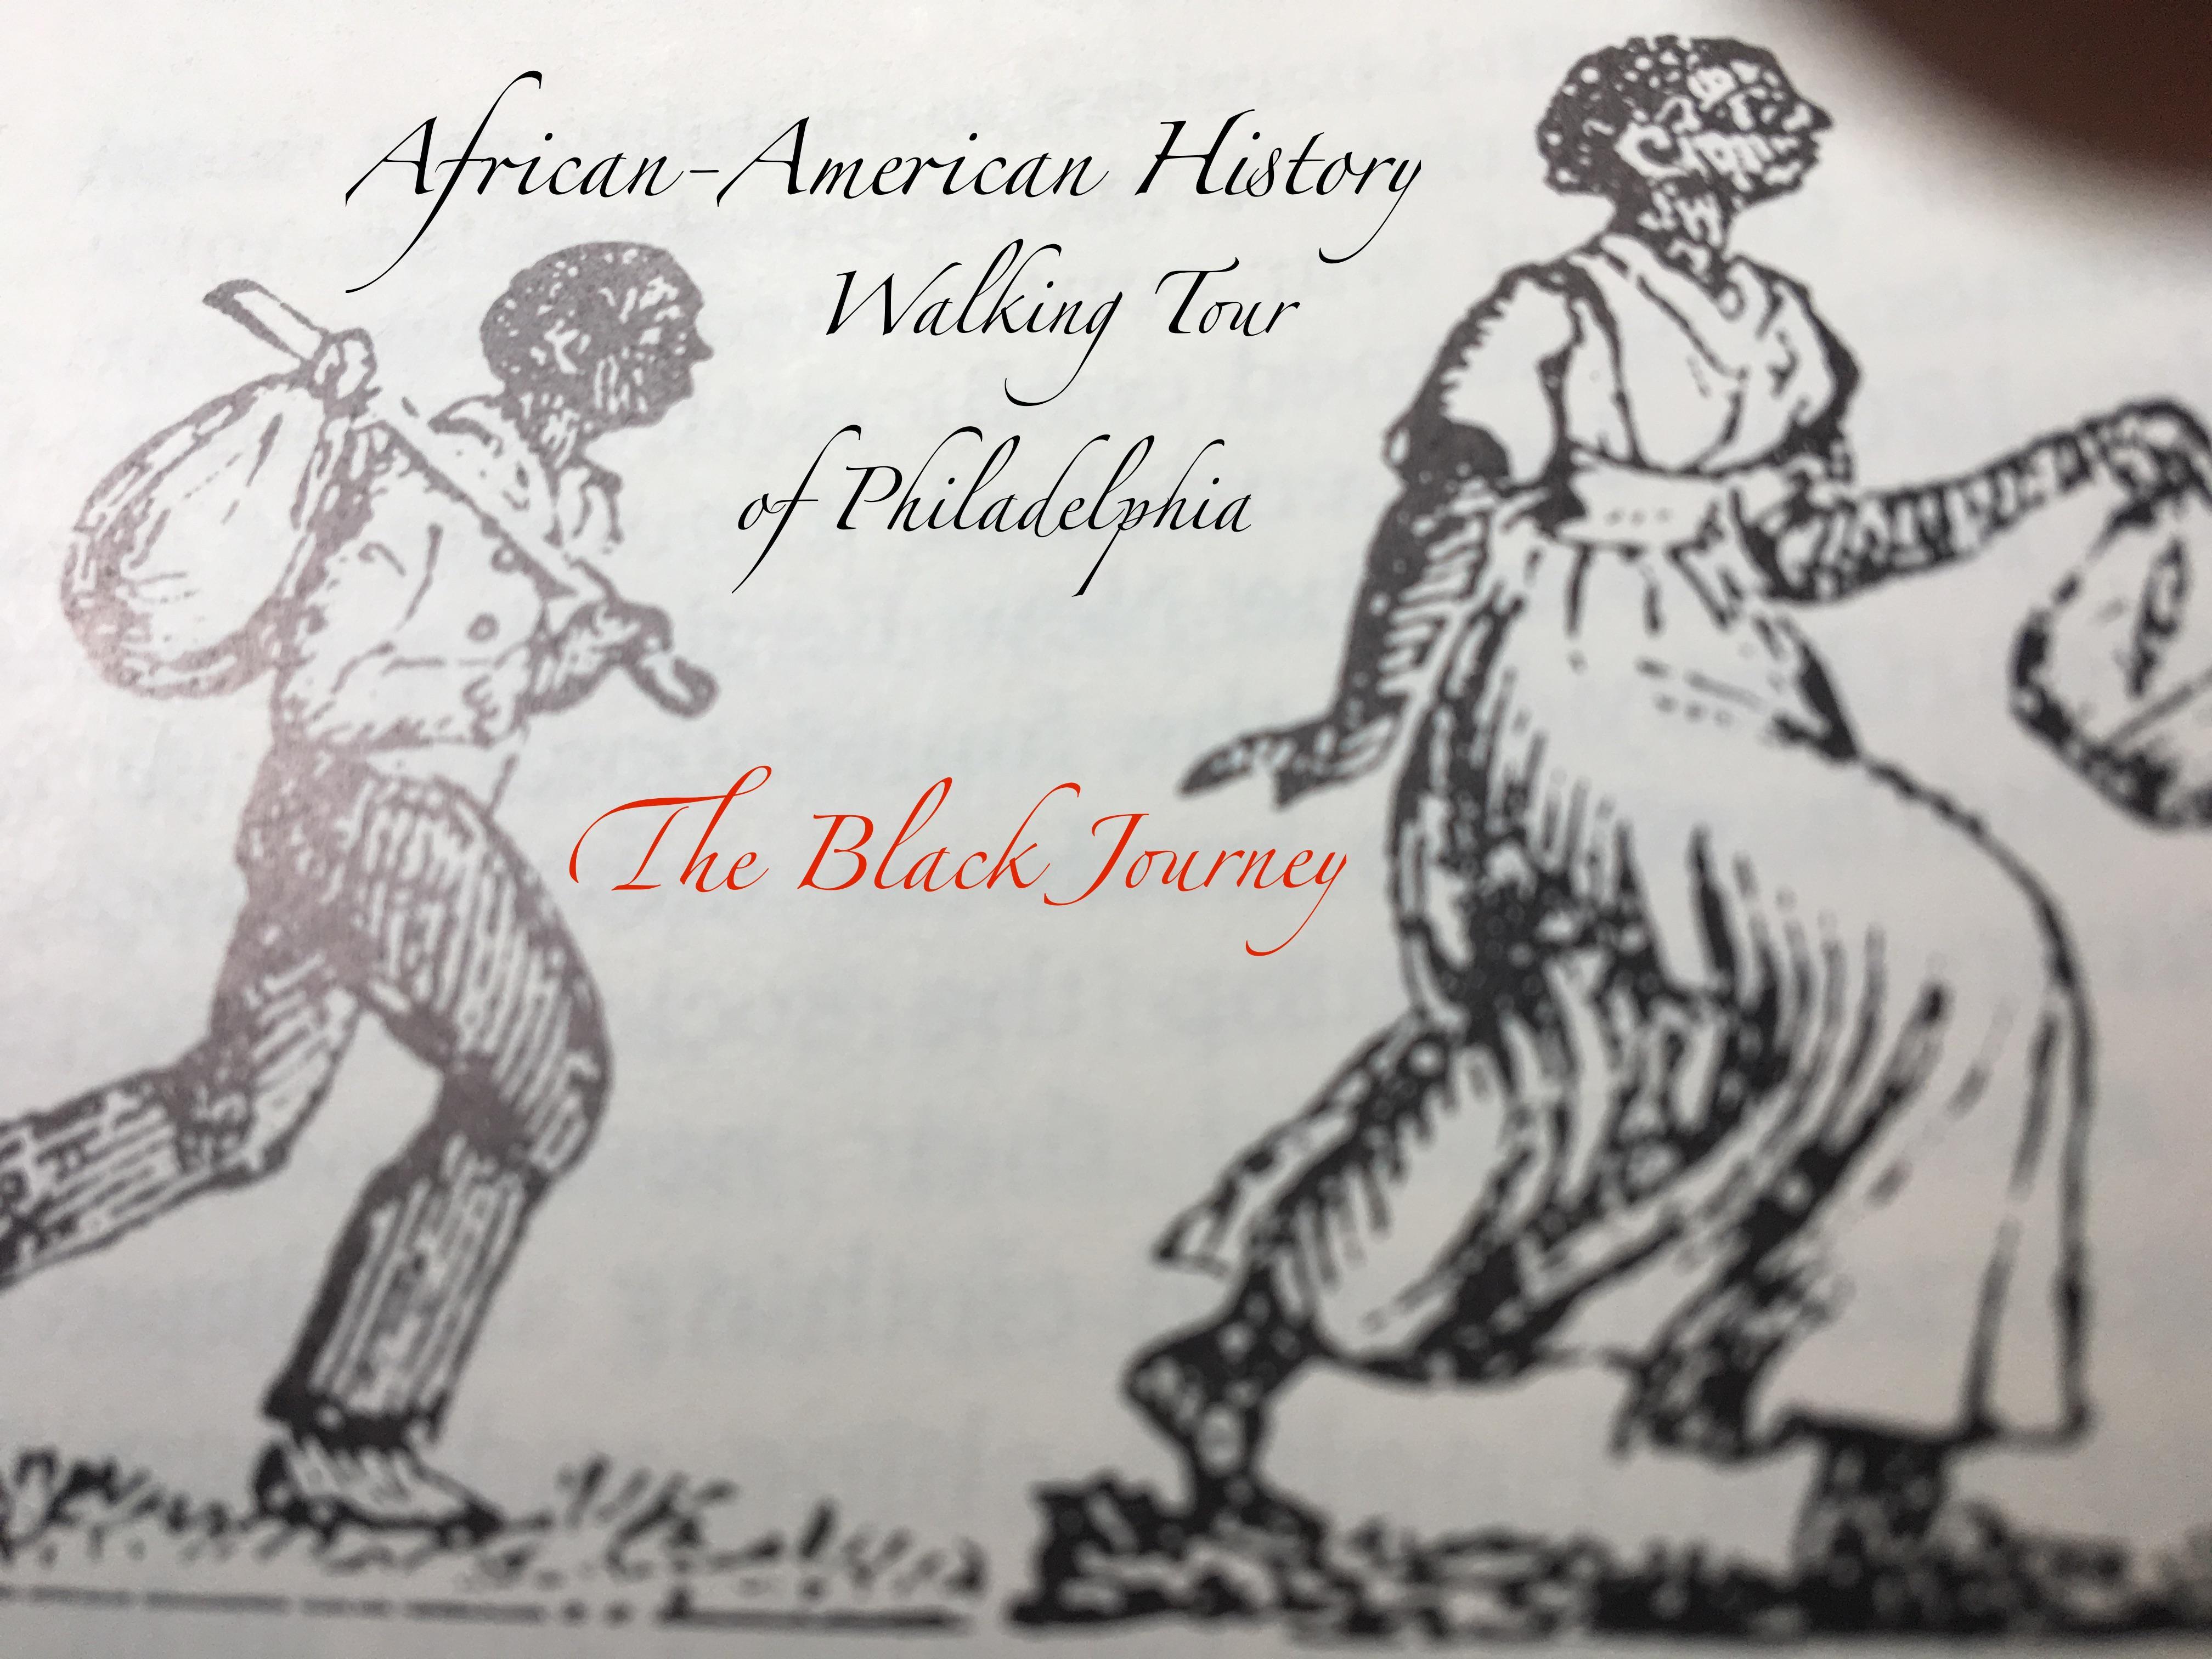 The Black Journey: African-American History Walking Tour of Philadelphia